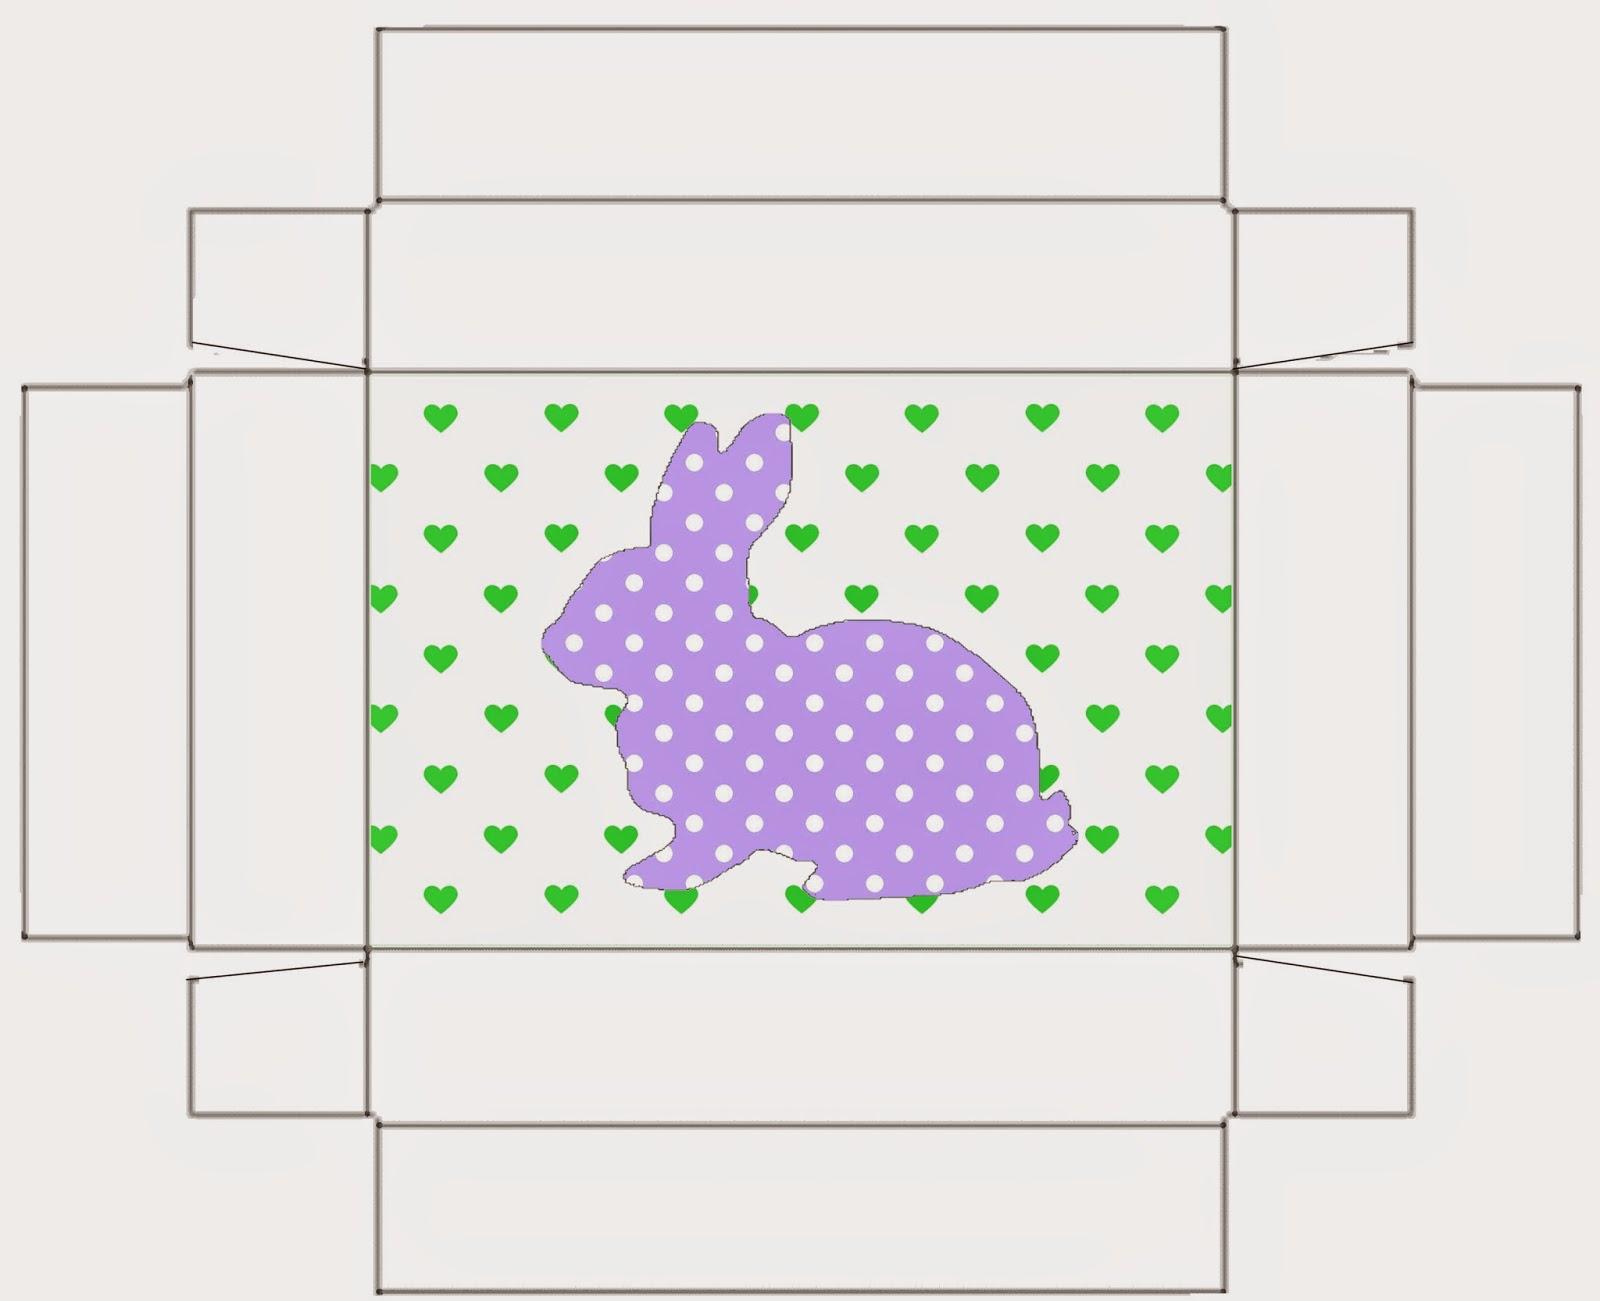 http://4.bp.blogspot.com/-9mnKc_3D_Ws/VRv7apPy2xI/AAAAAAAAMP8/jFSwcE_N_oE/s1600/bunnytraybox_altcolors.jpg